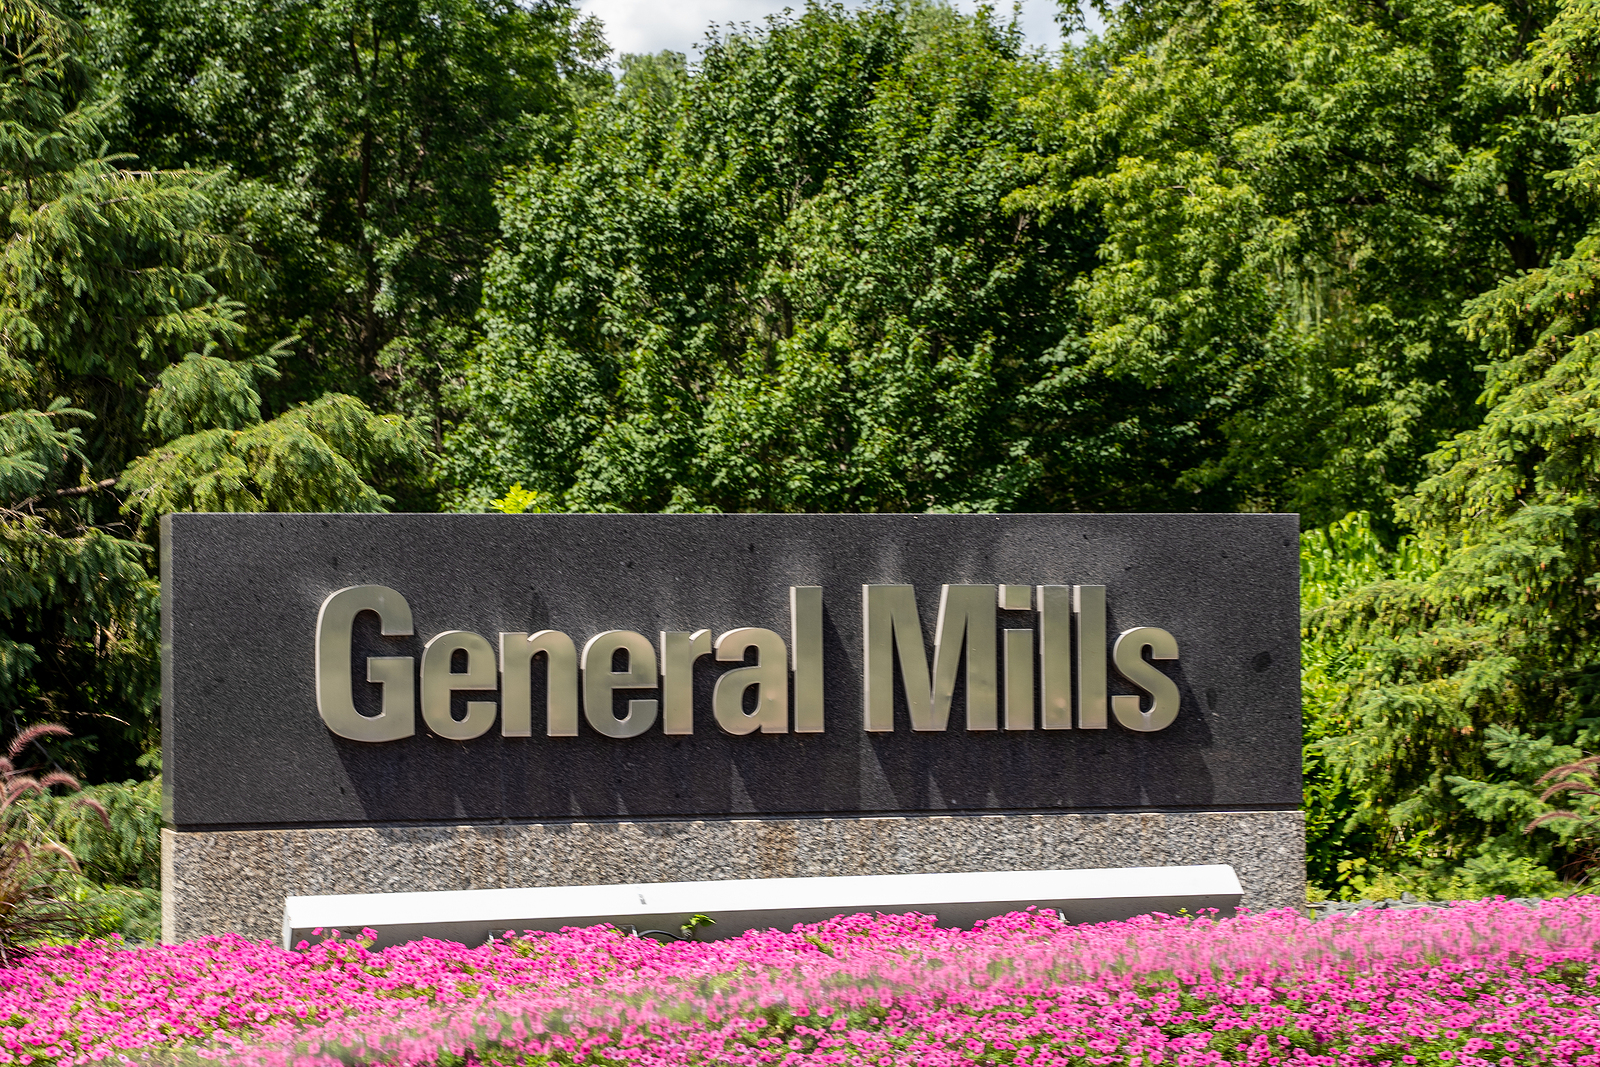 General Mills GIS stock news and analysis